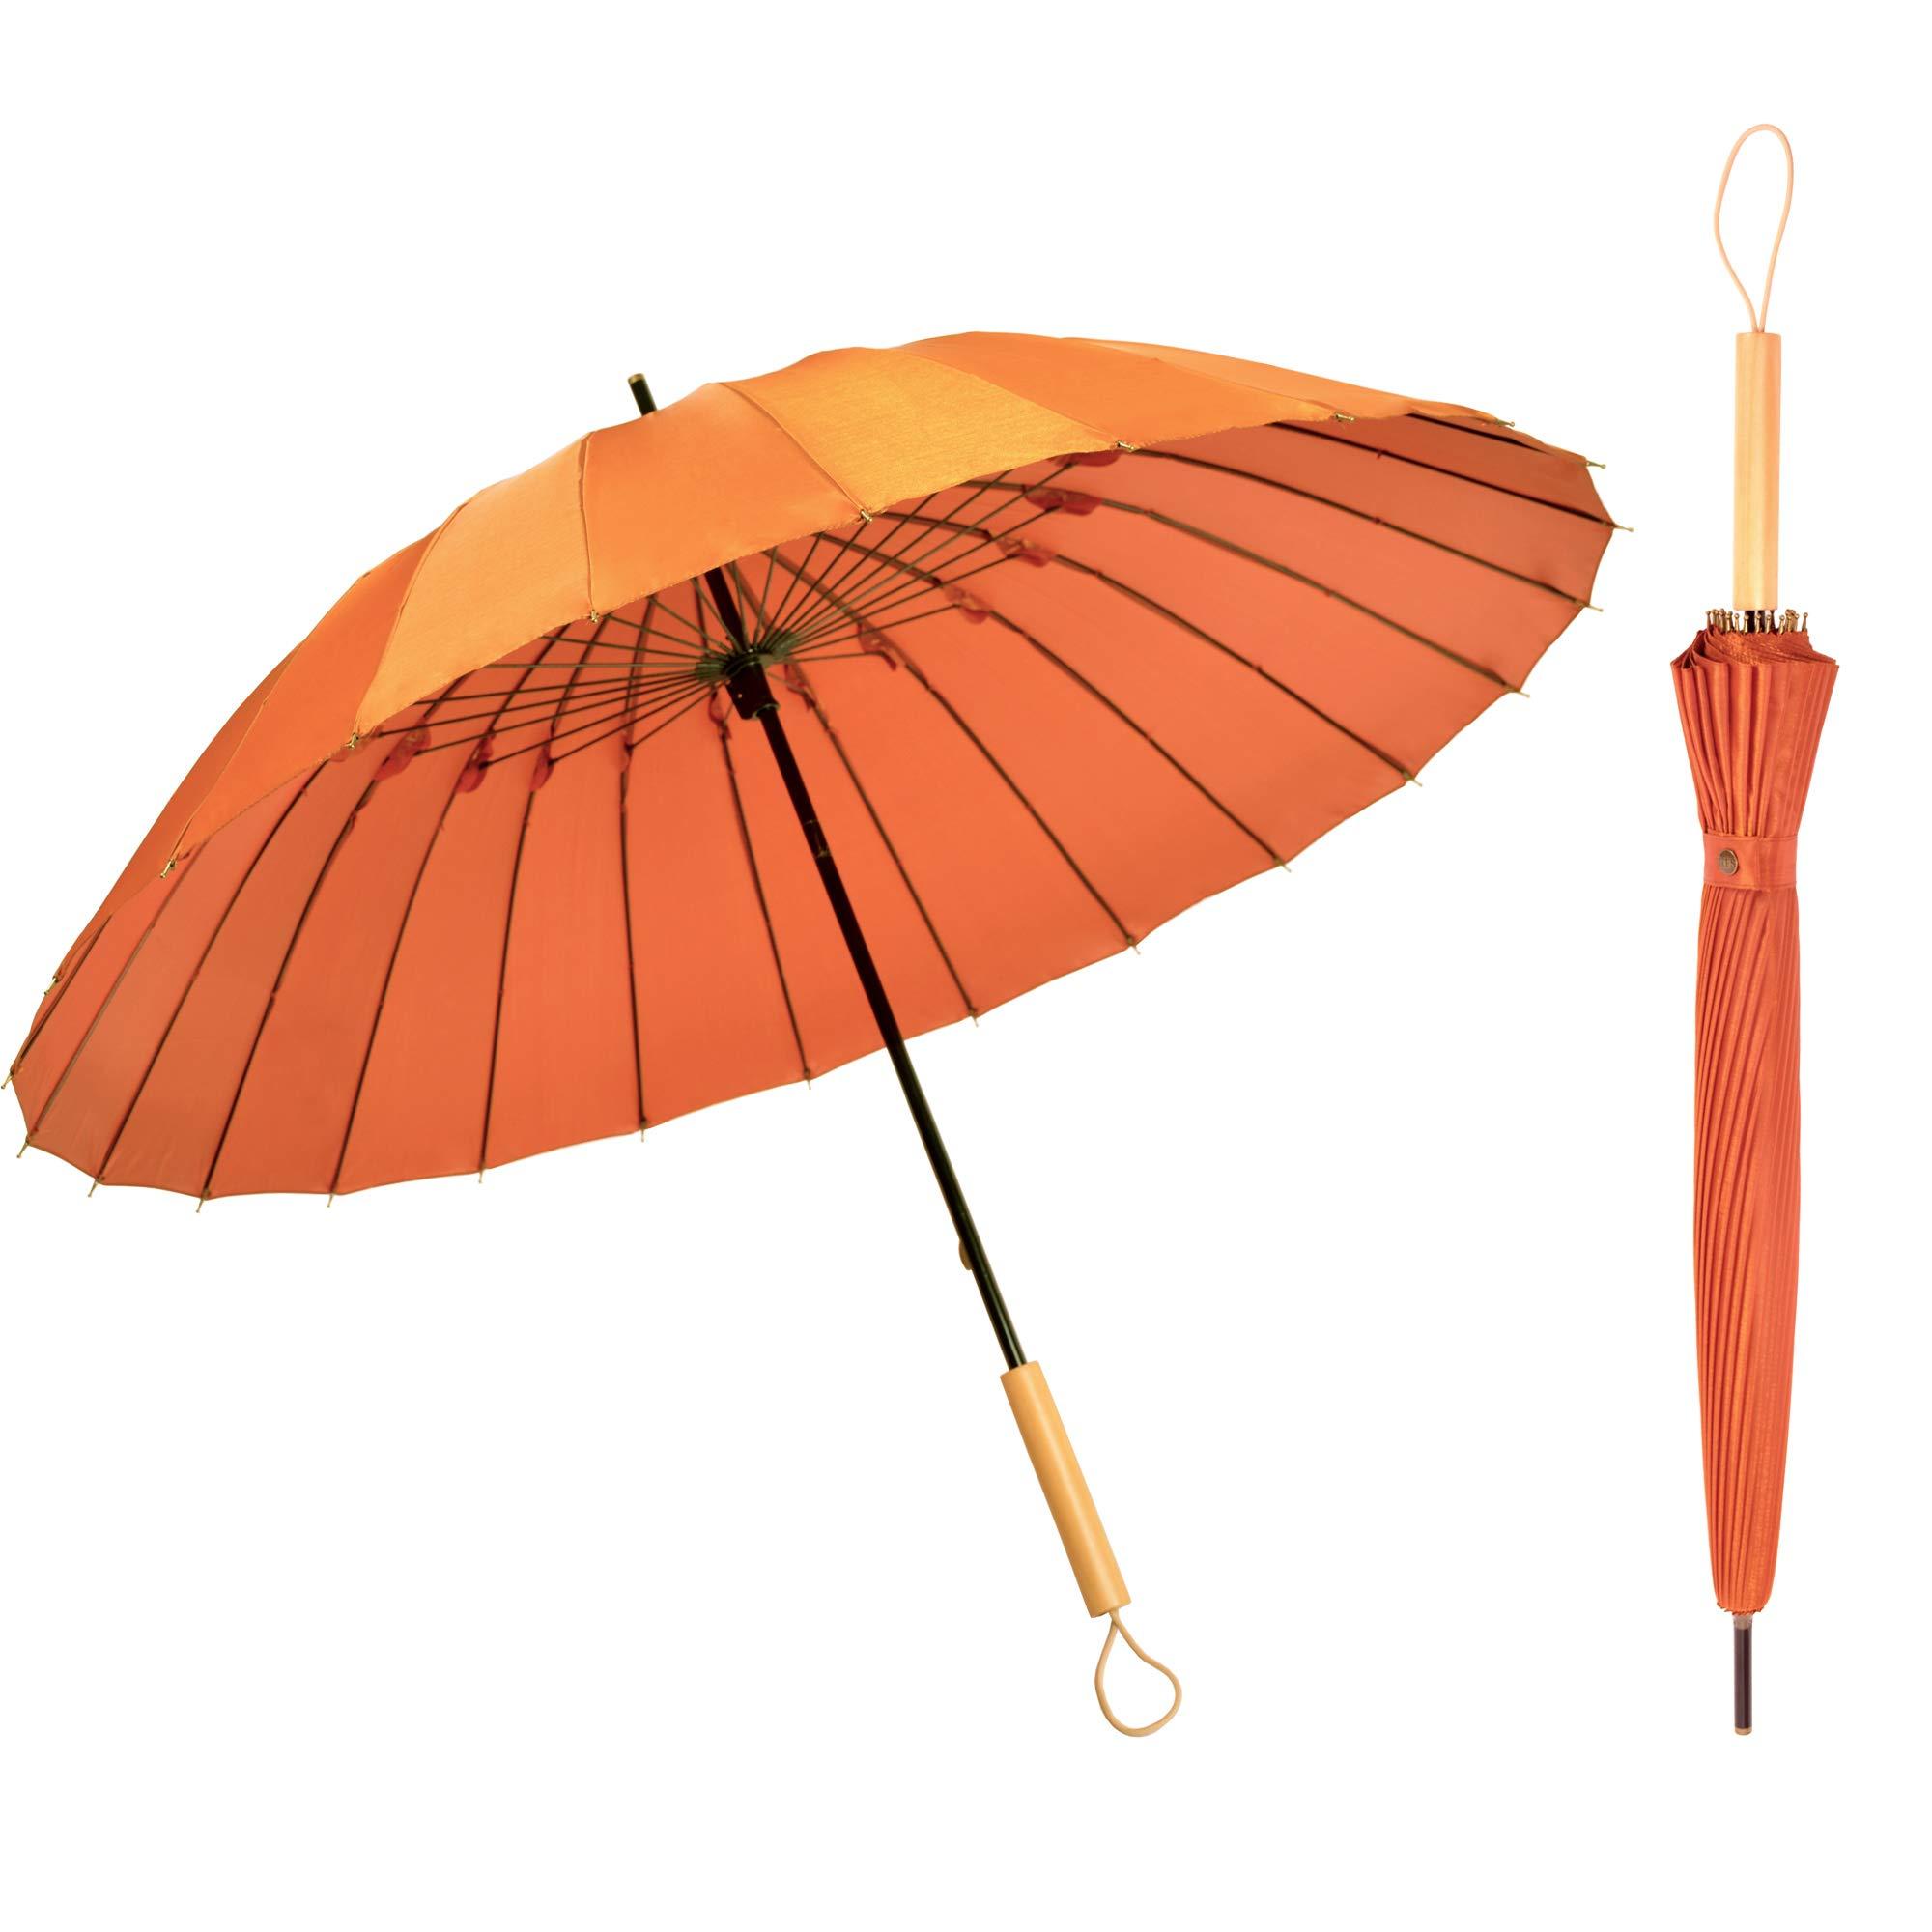 Kung Fu Smith Janpanese Parasol Rain Umbrella - Large Windproof and Ultra Light - Orange and Wood Handle